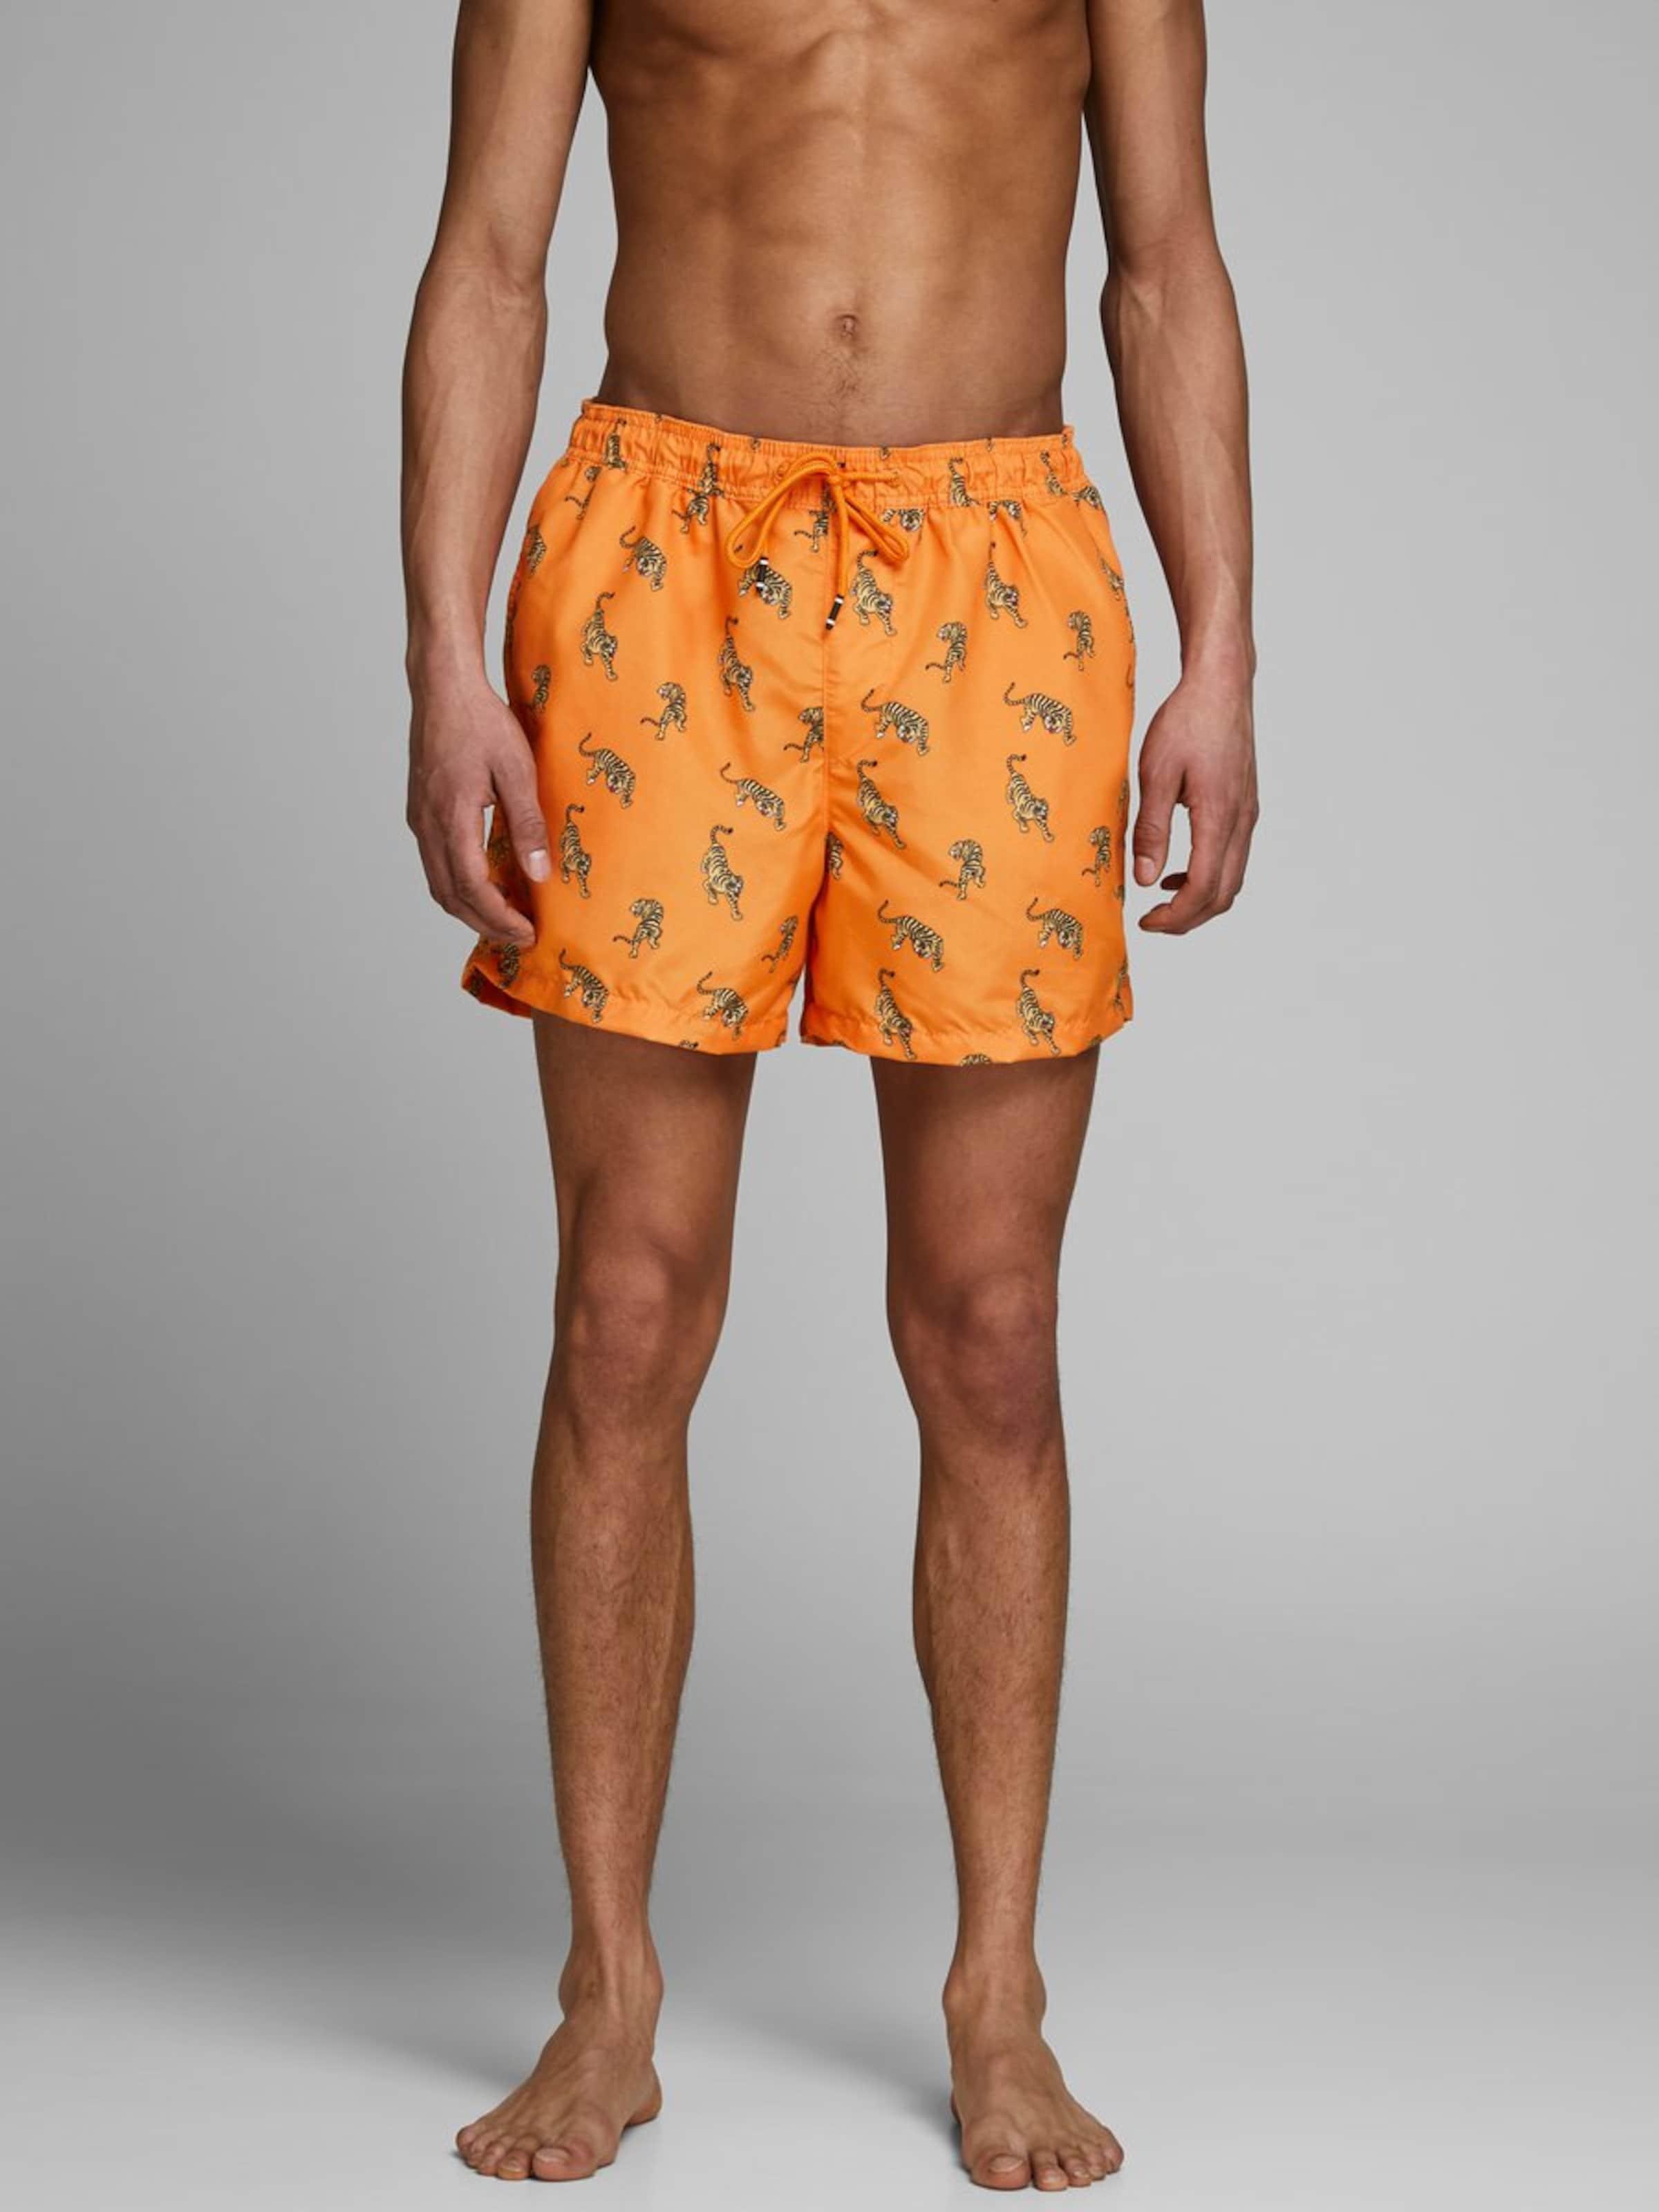 En Shorts Bain Orange Jackamp; De Jones vmNw0POyn8